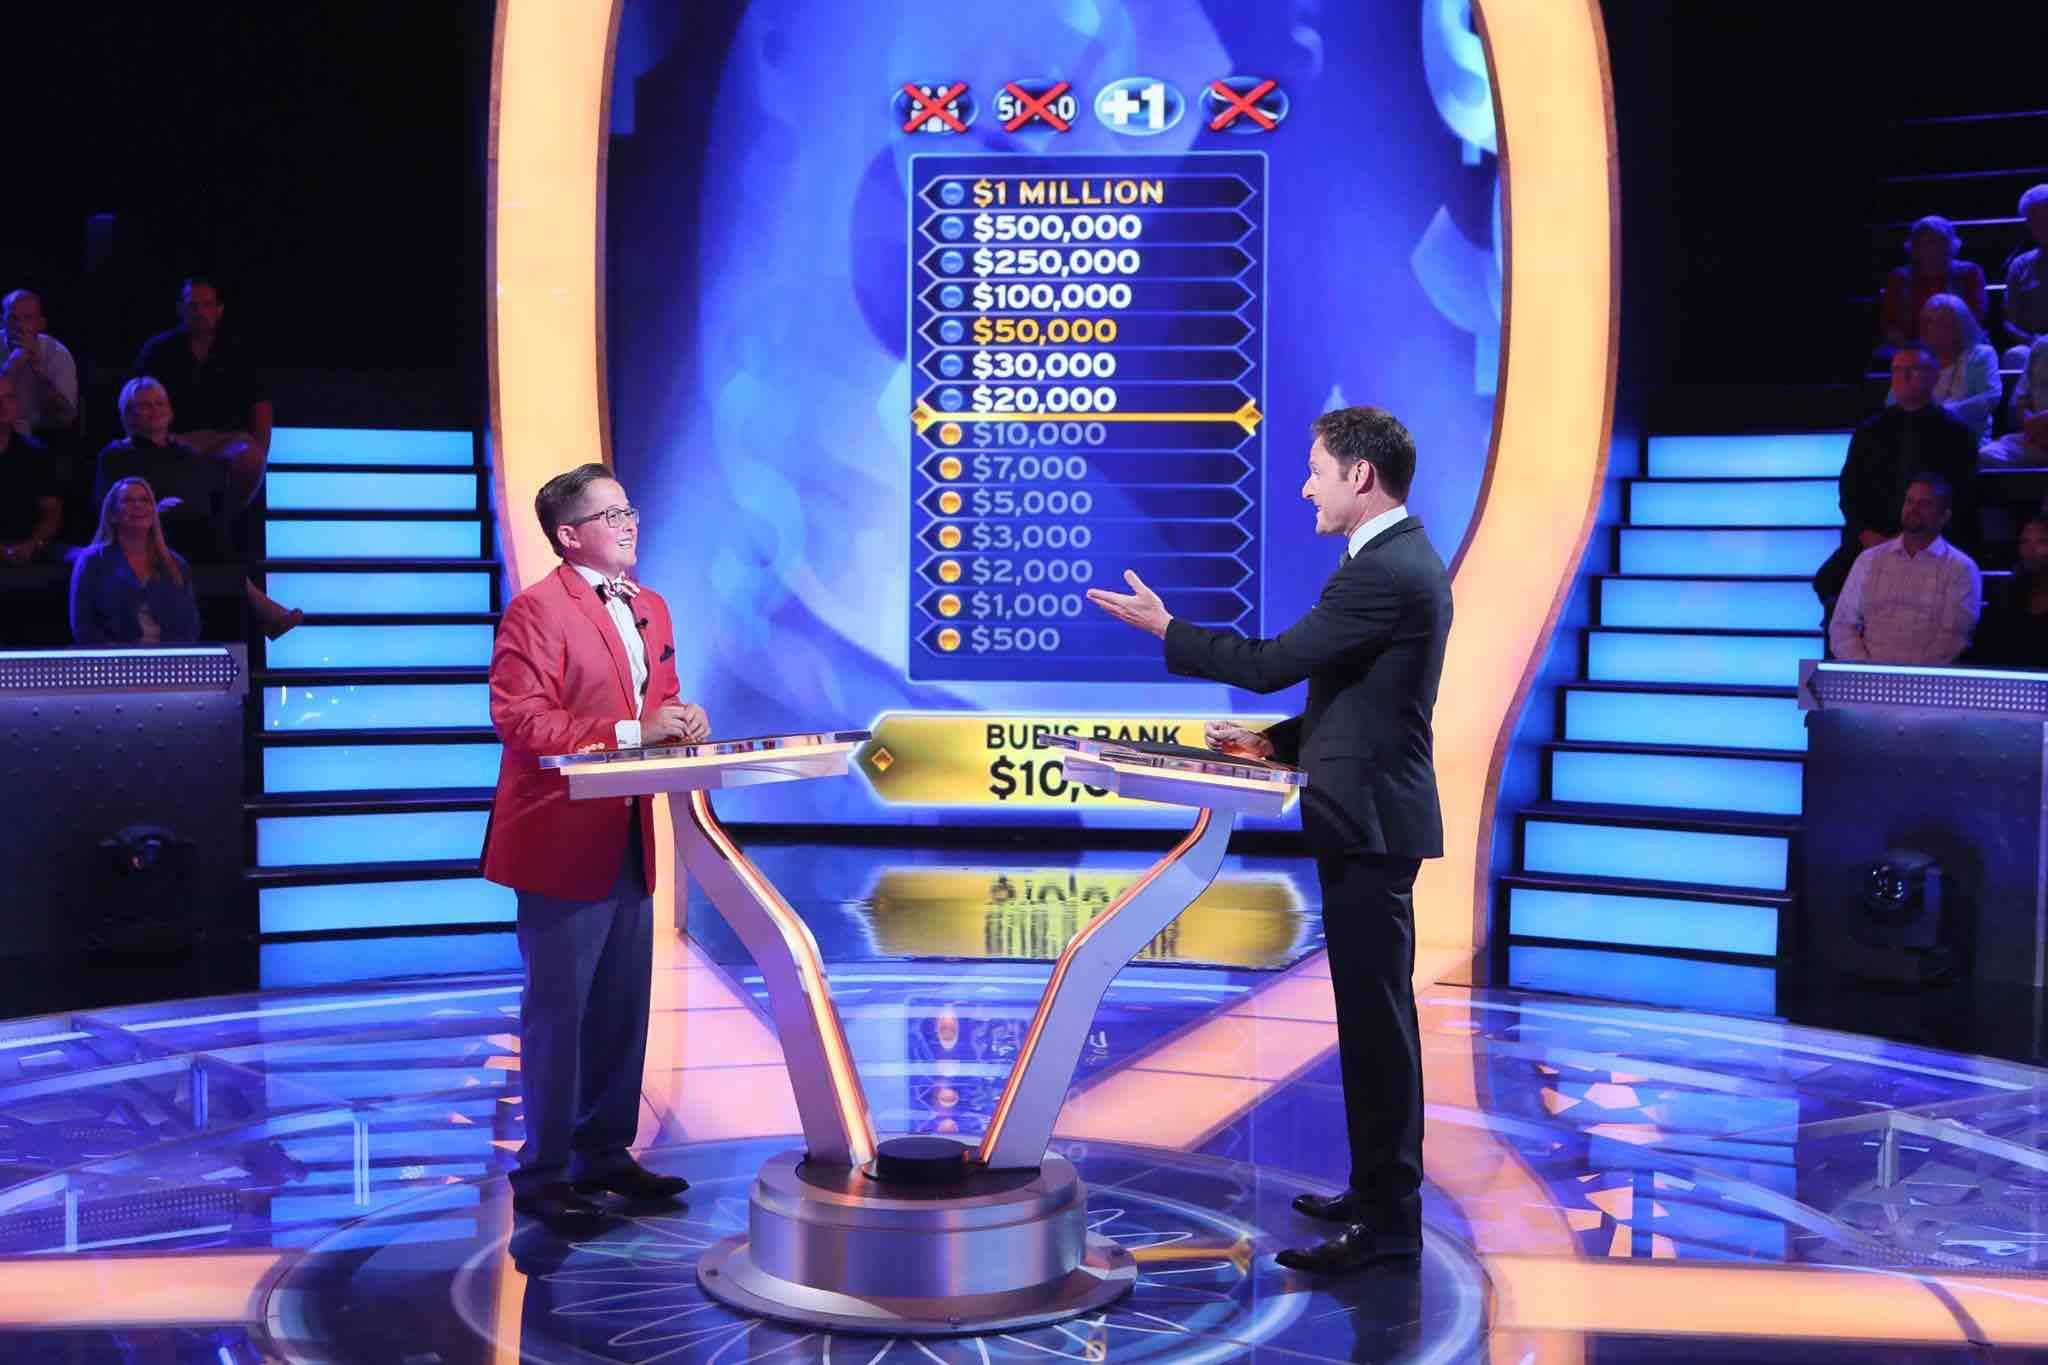 El programa 'Who Wants to Be a Millionaire' está buscando concursantes en Las Vegas